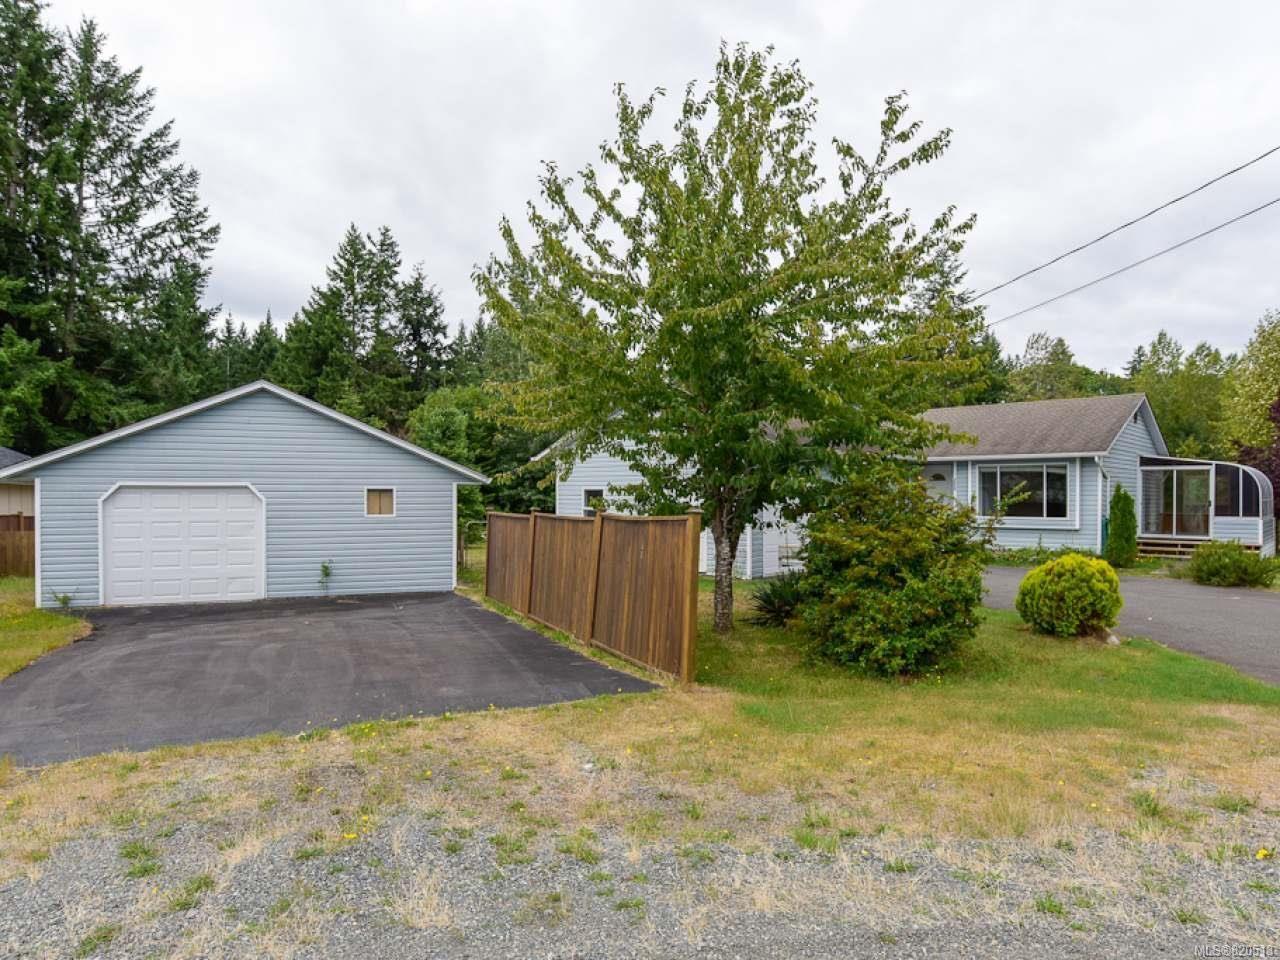 Main Photo: 1273 Miller Rd in COMOX: CV Comox Peninsula House for sale (Comox Valley)  : MLS®# 820513